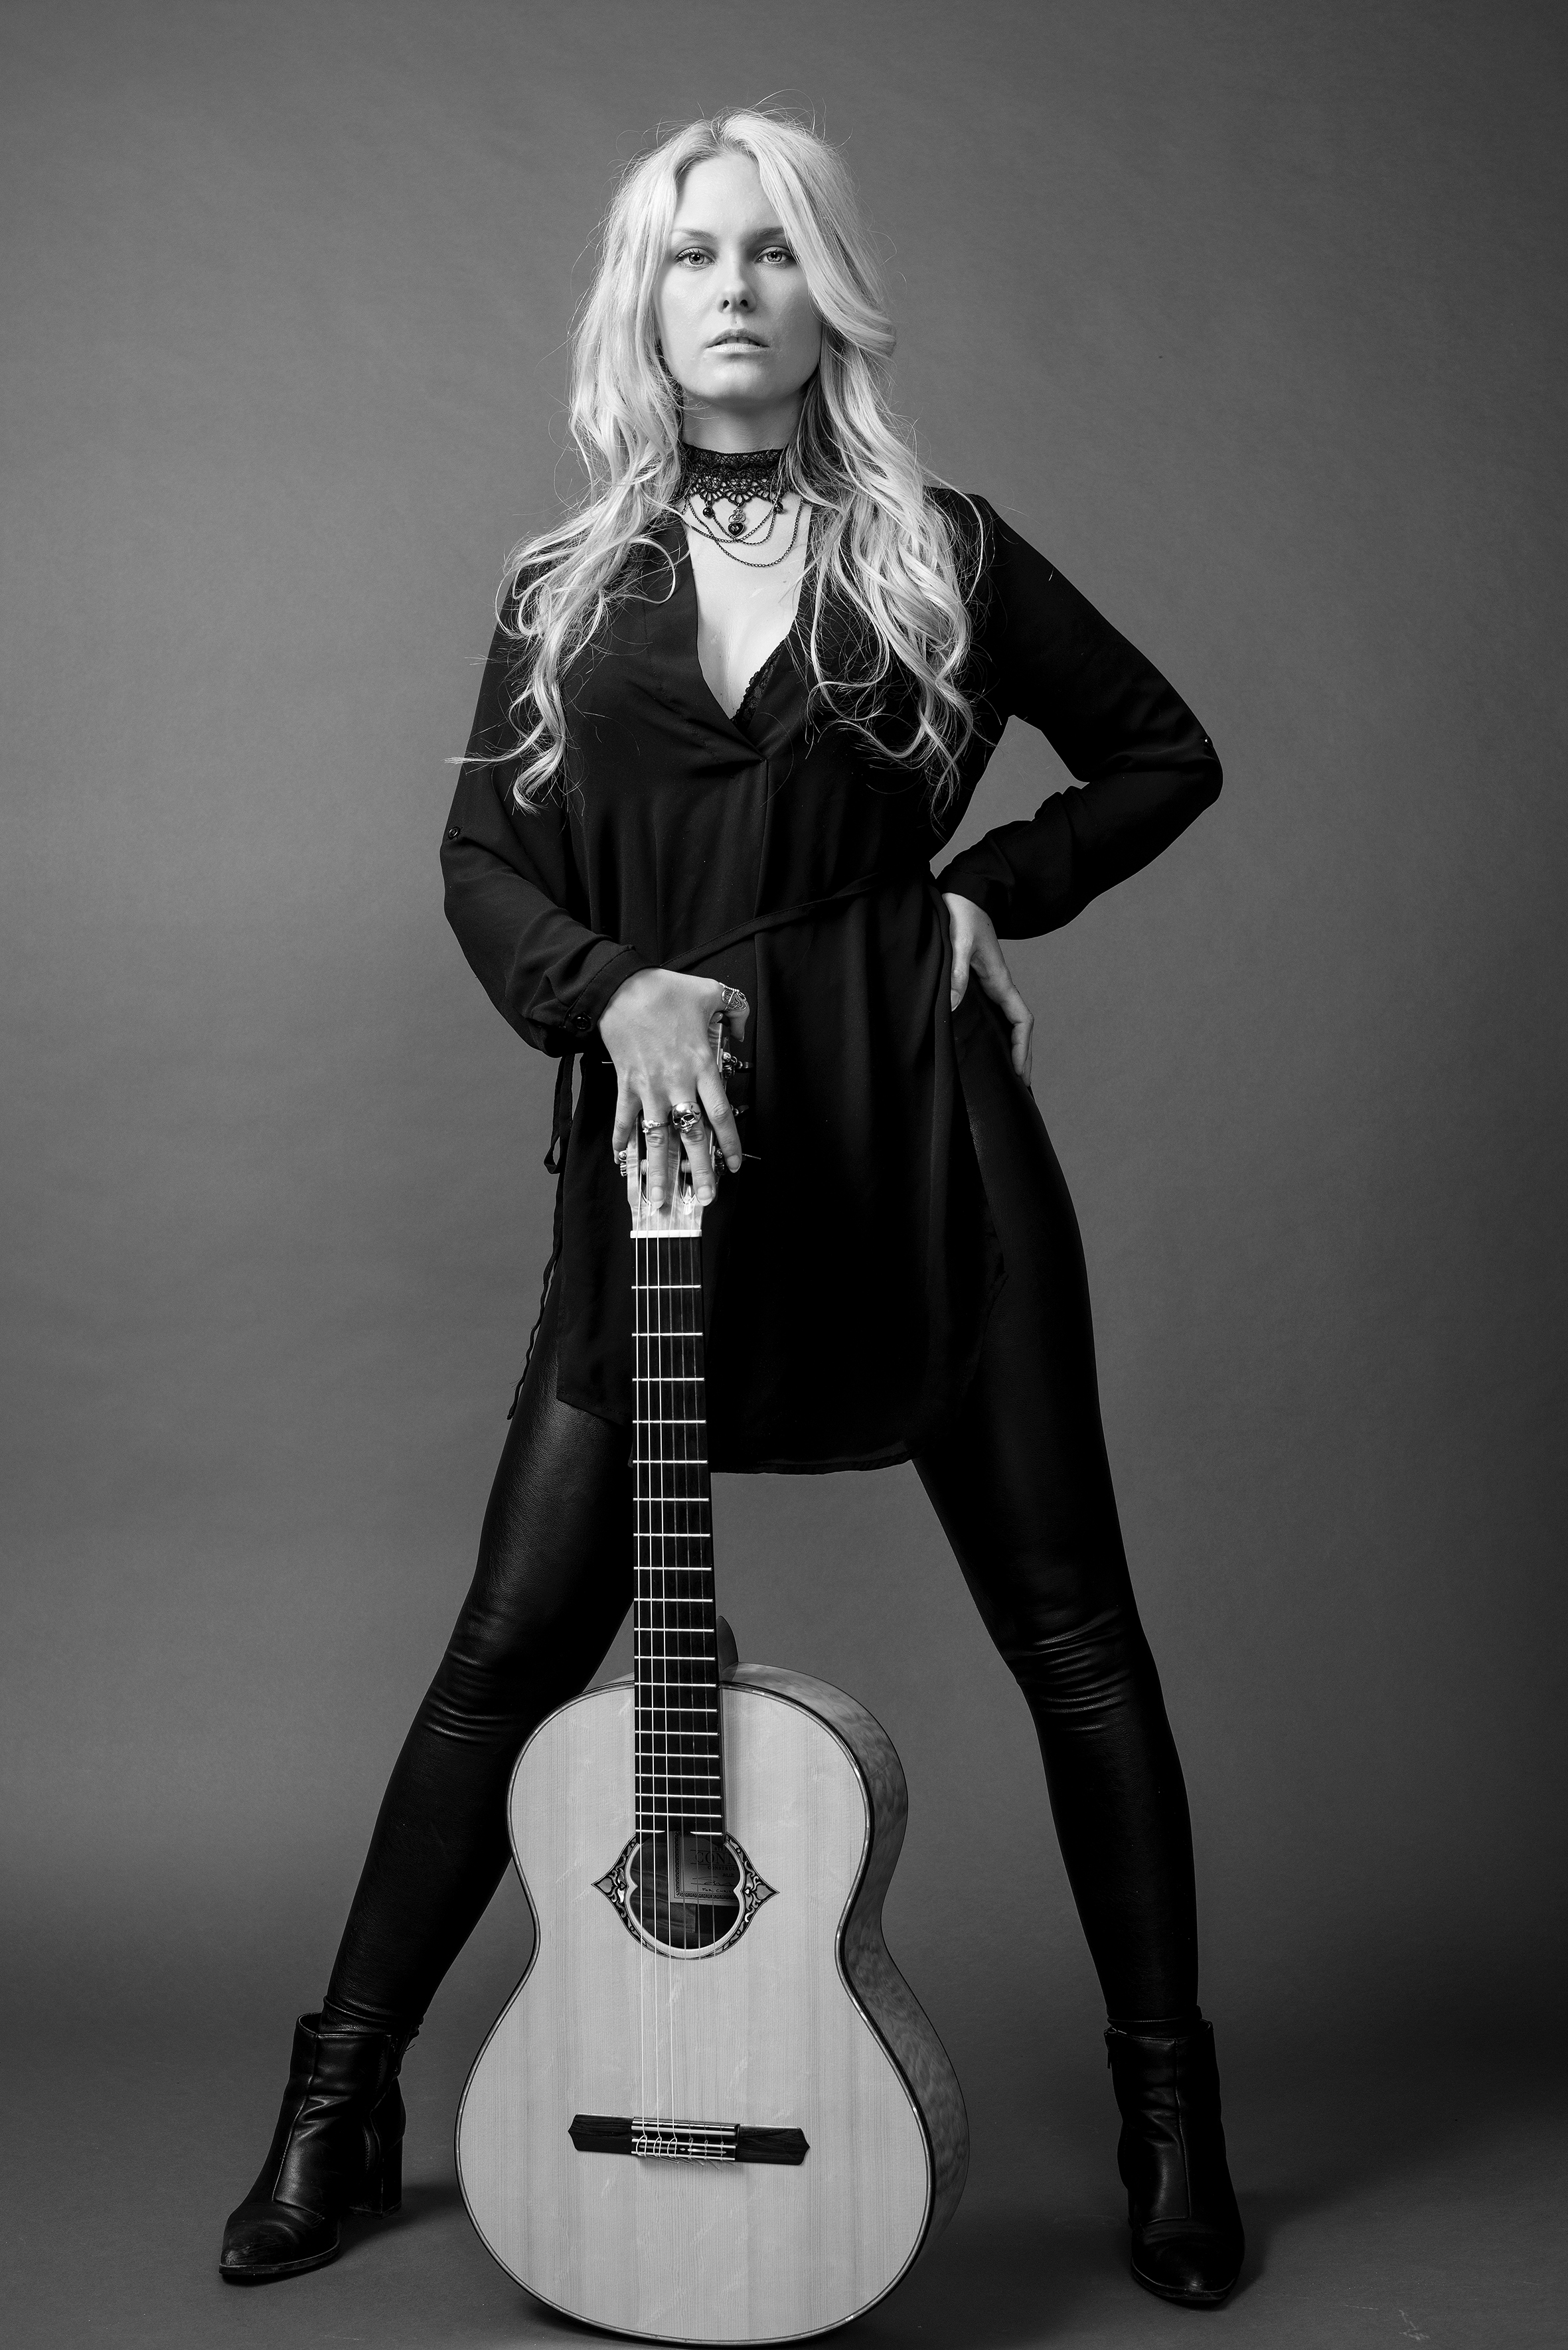 Opening Act - Christina Sandsengen, award-winning classical guitarist, NACC LA Associate member and entrepreneur